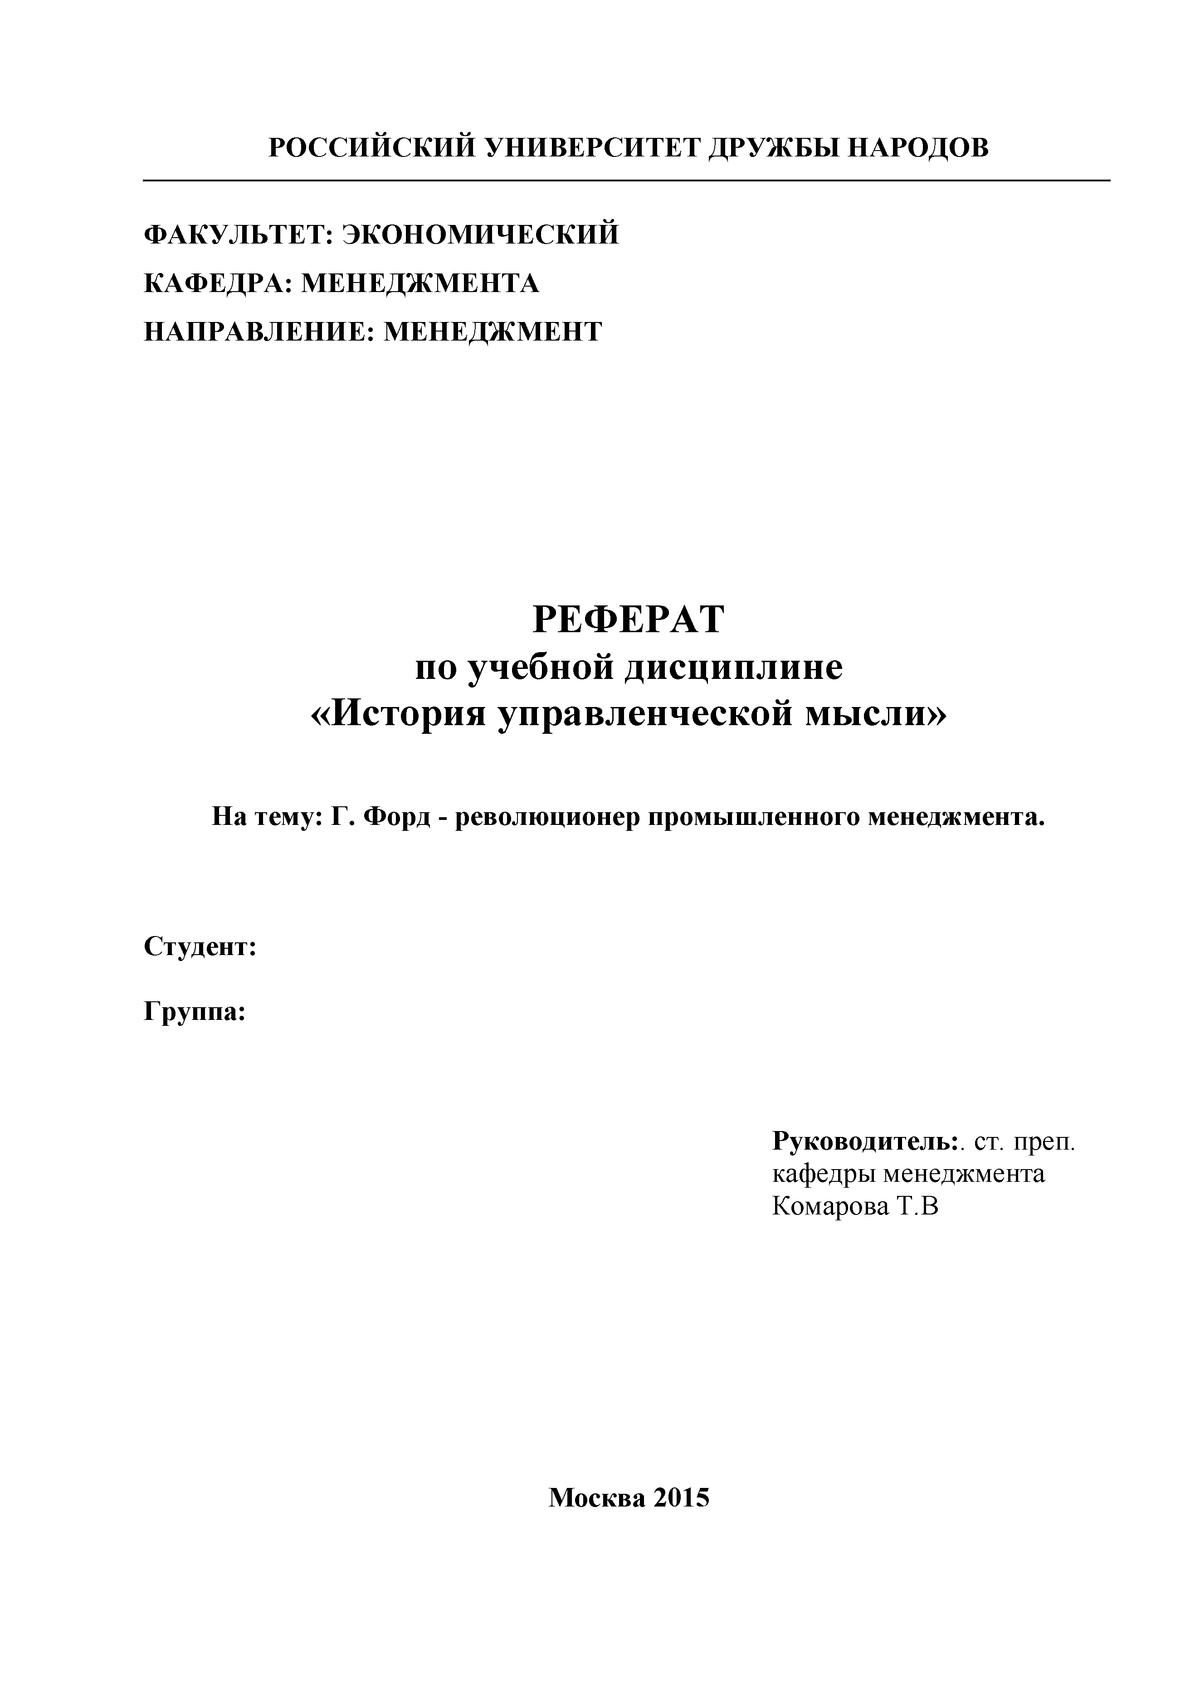 Генри форд доклад по менеджменту 2576